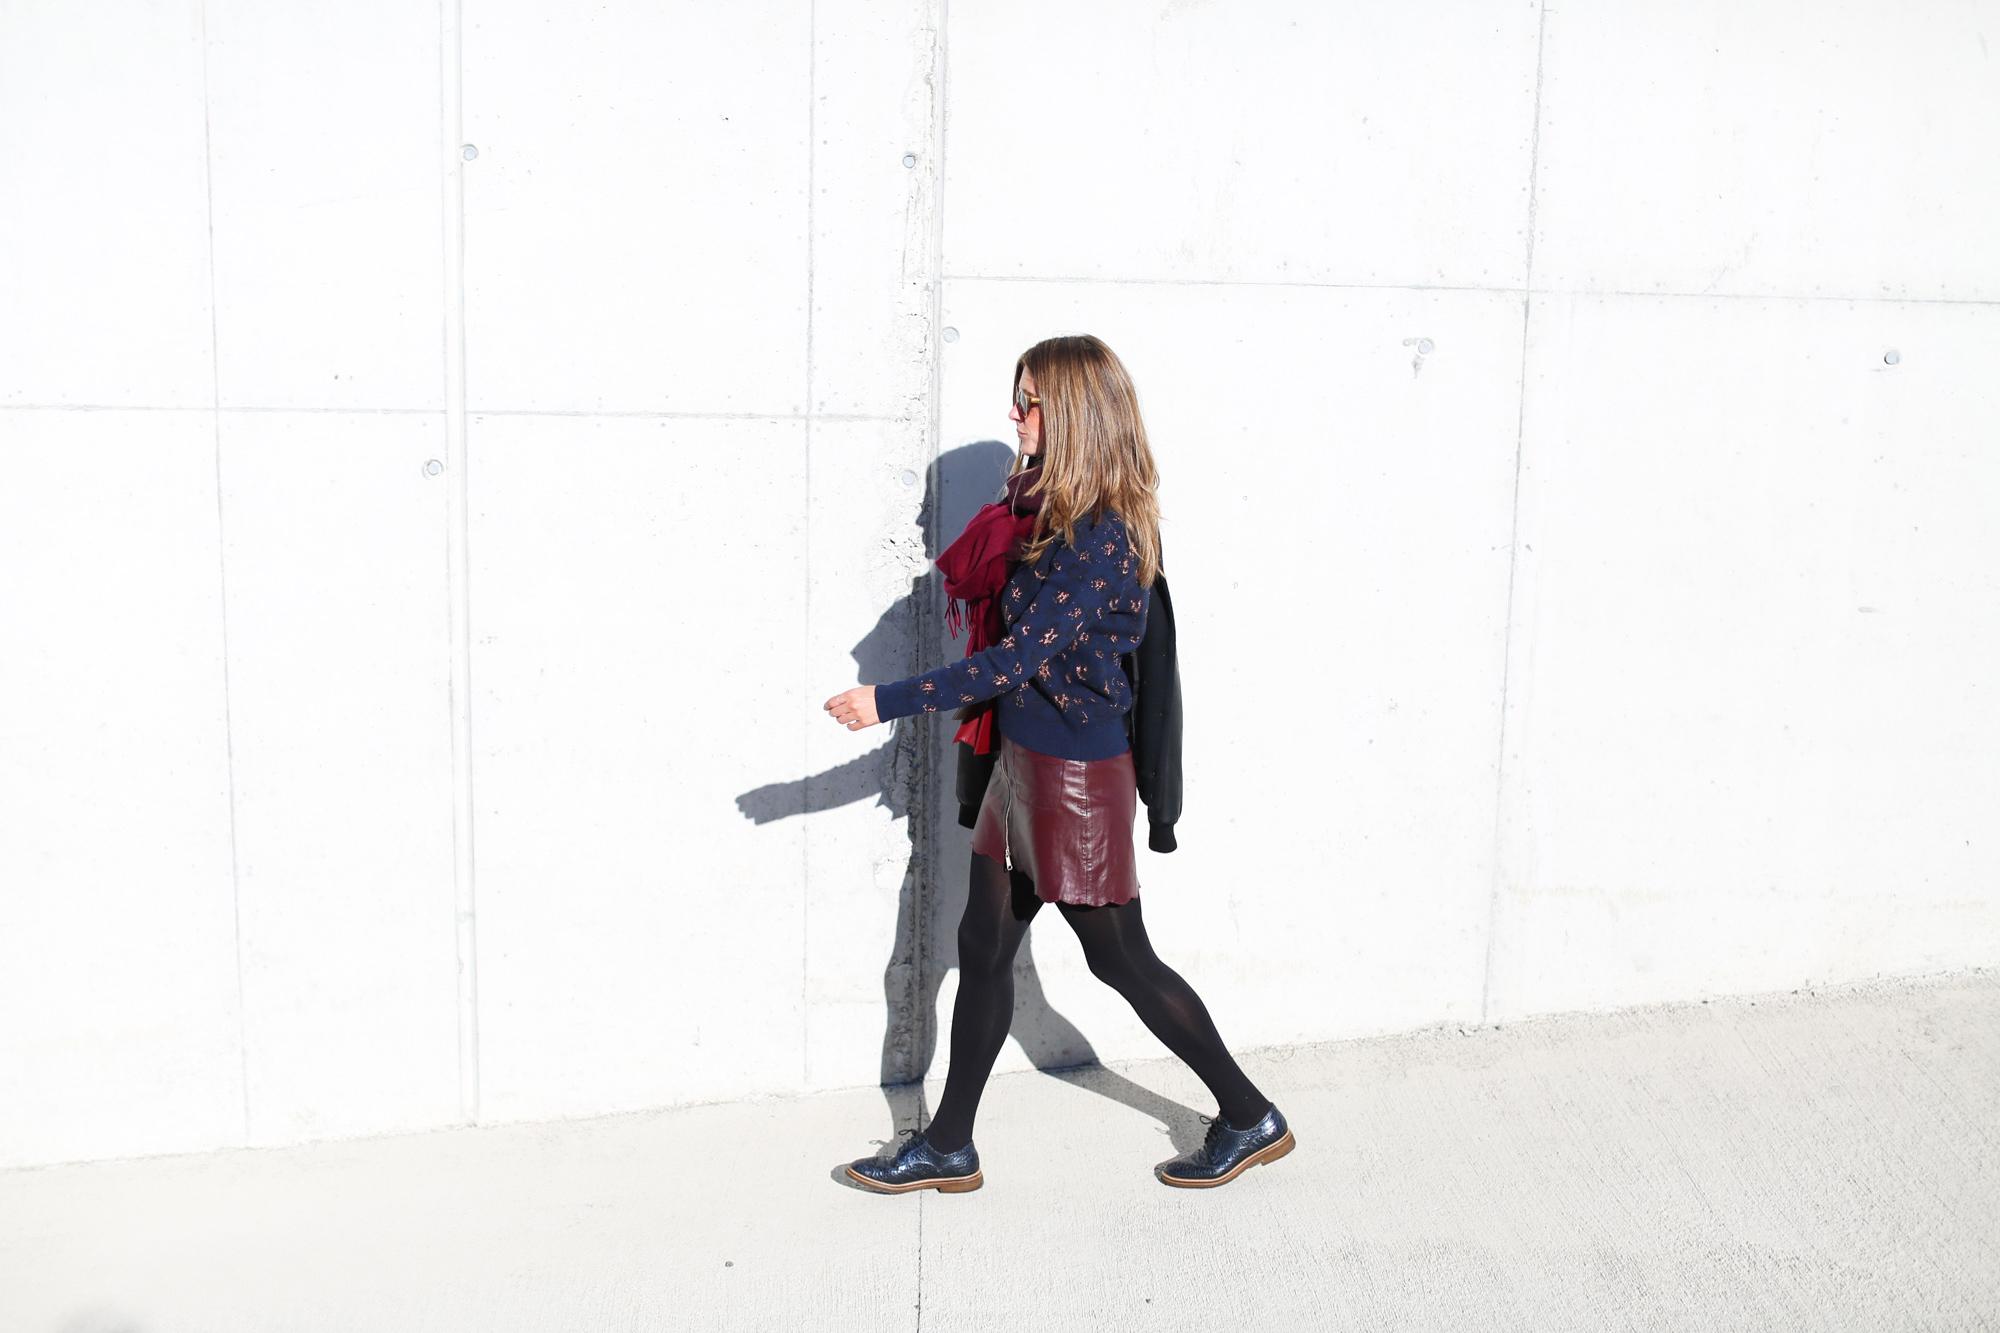 Clochet_fashionblogger_streetstyle_andotherstories_metallicflowersknit_heroscarf_leatherminiskirt-4